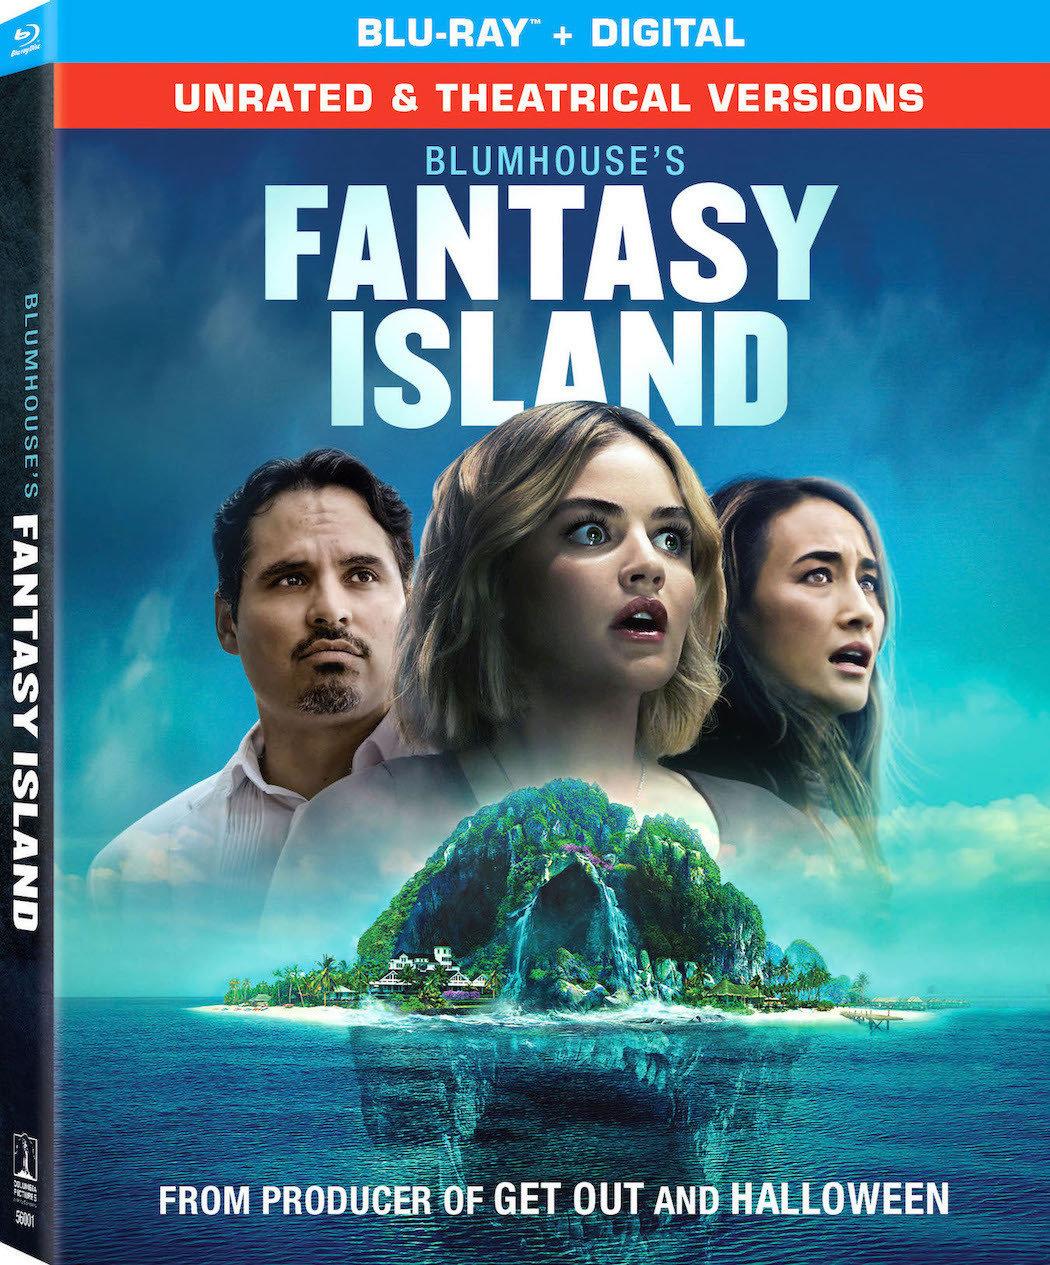 Fantasy Island (2020) poster image